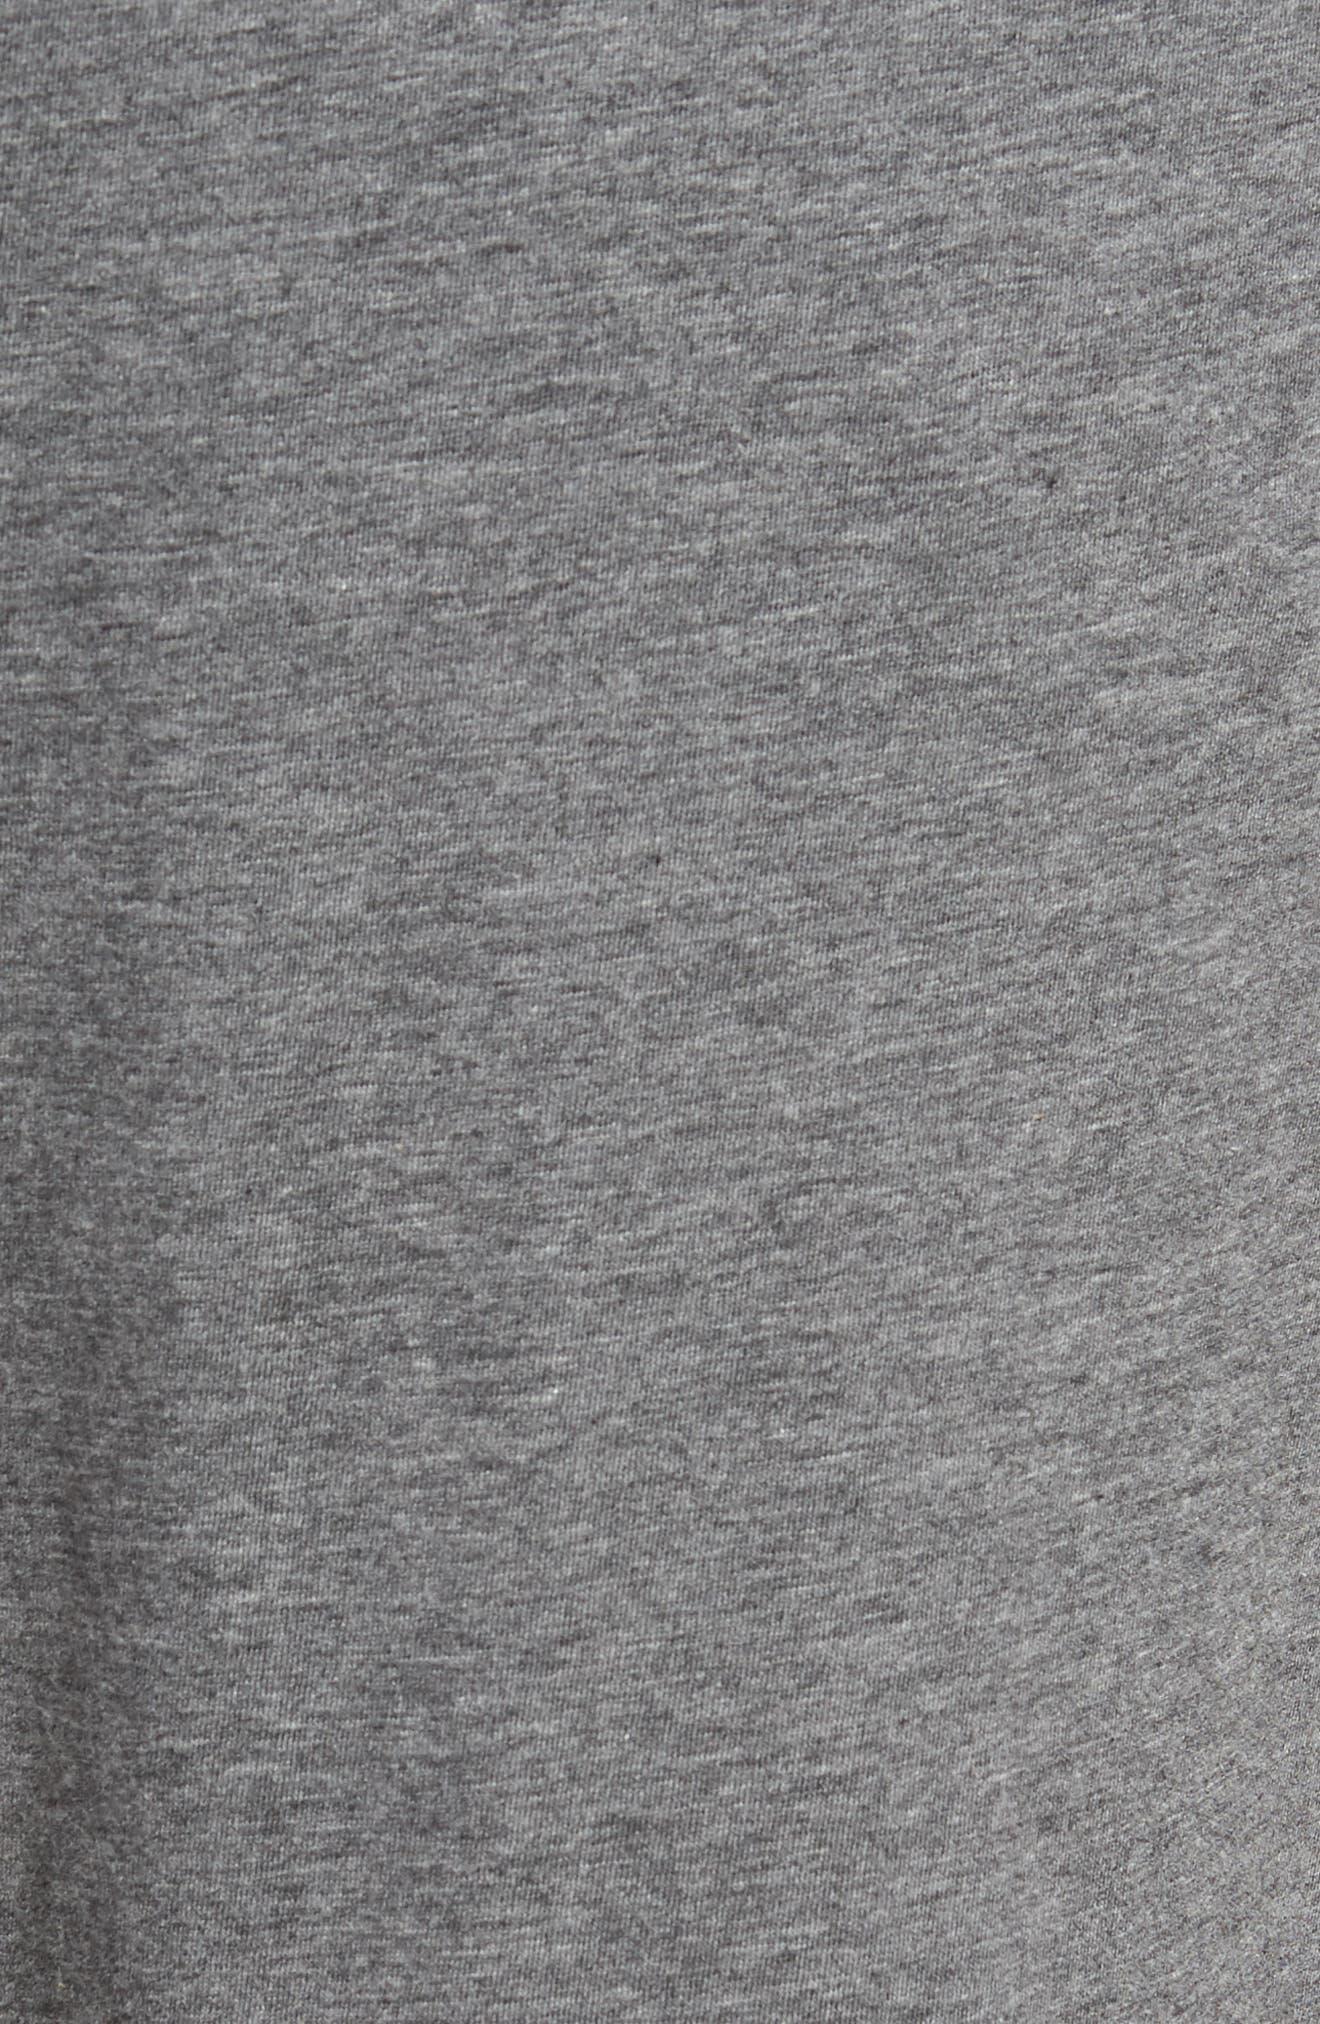 Peruvian Pima Lightweight Cotton Lounge Pants,                             Alternate thumbnail 5, color,                             CHARCOAL HEATHER